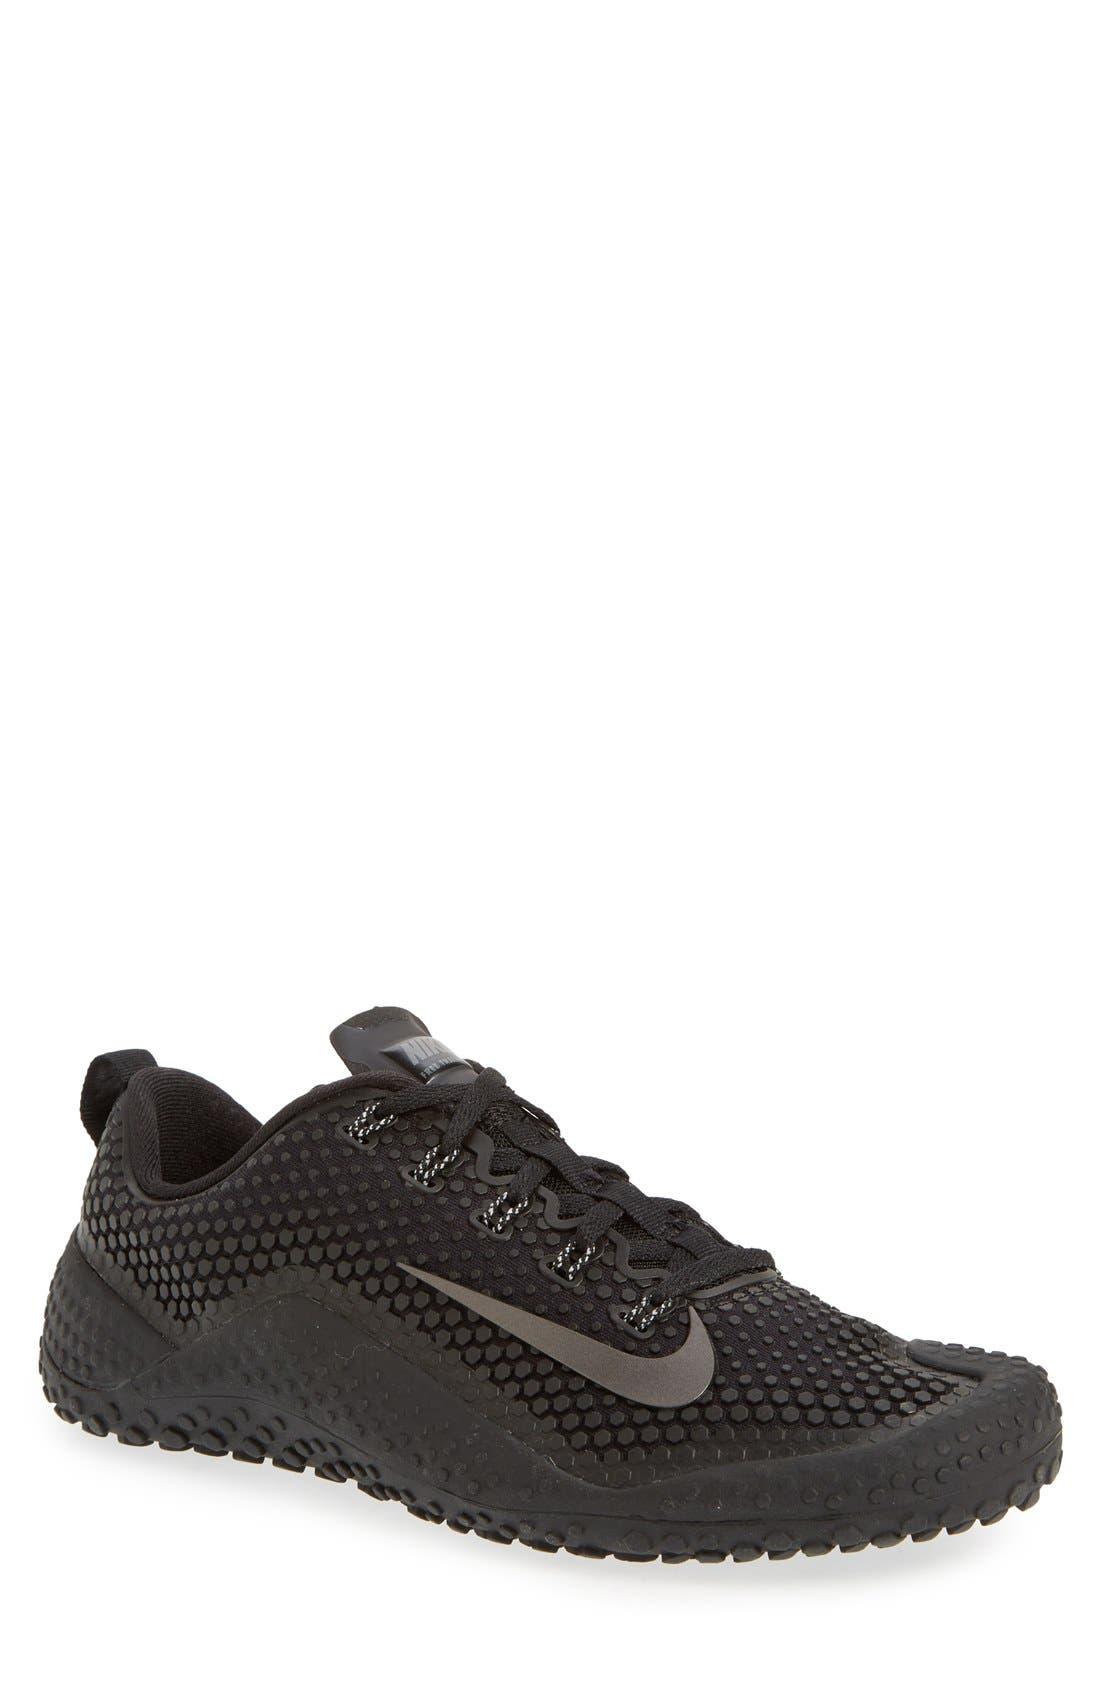 'Free Trainer 1.0' Training Shoe, Main, color, 001